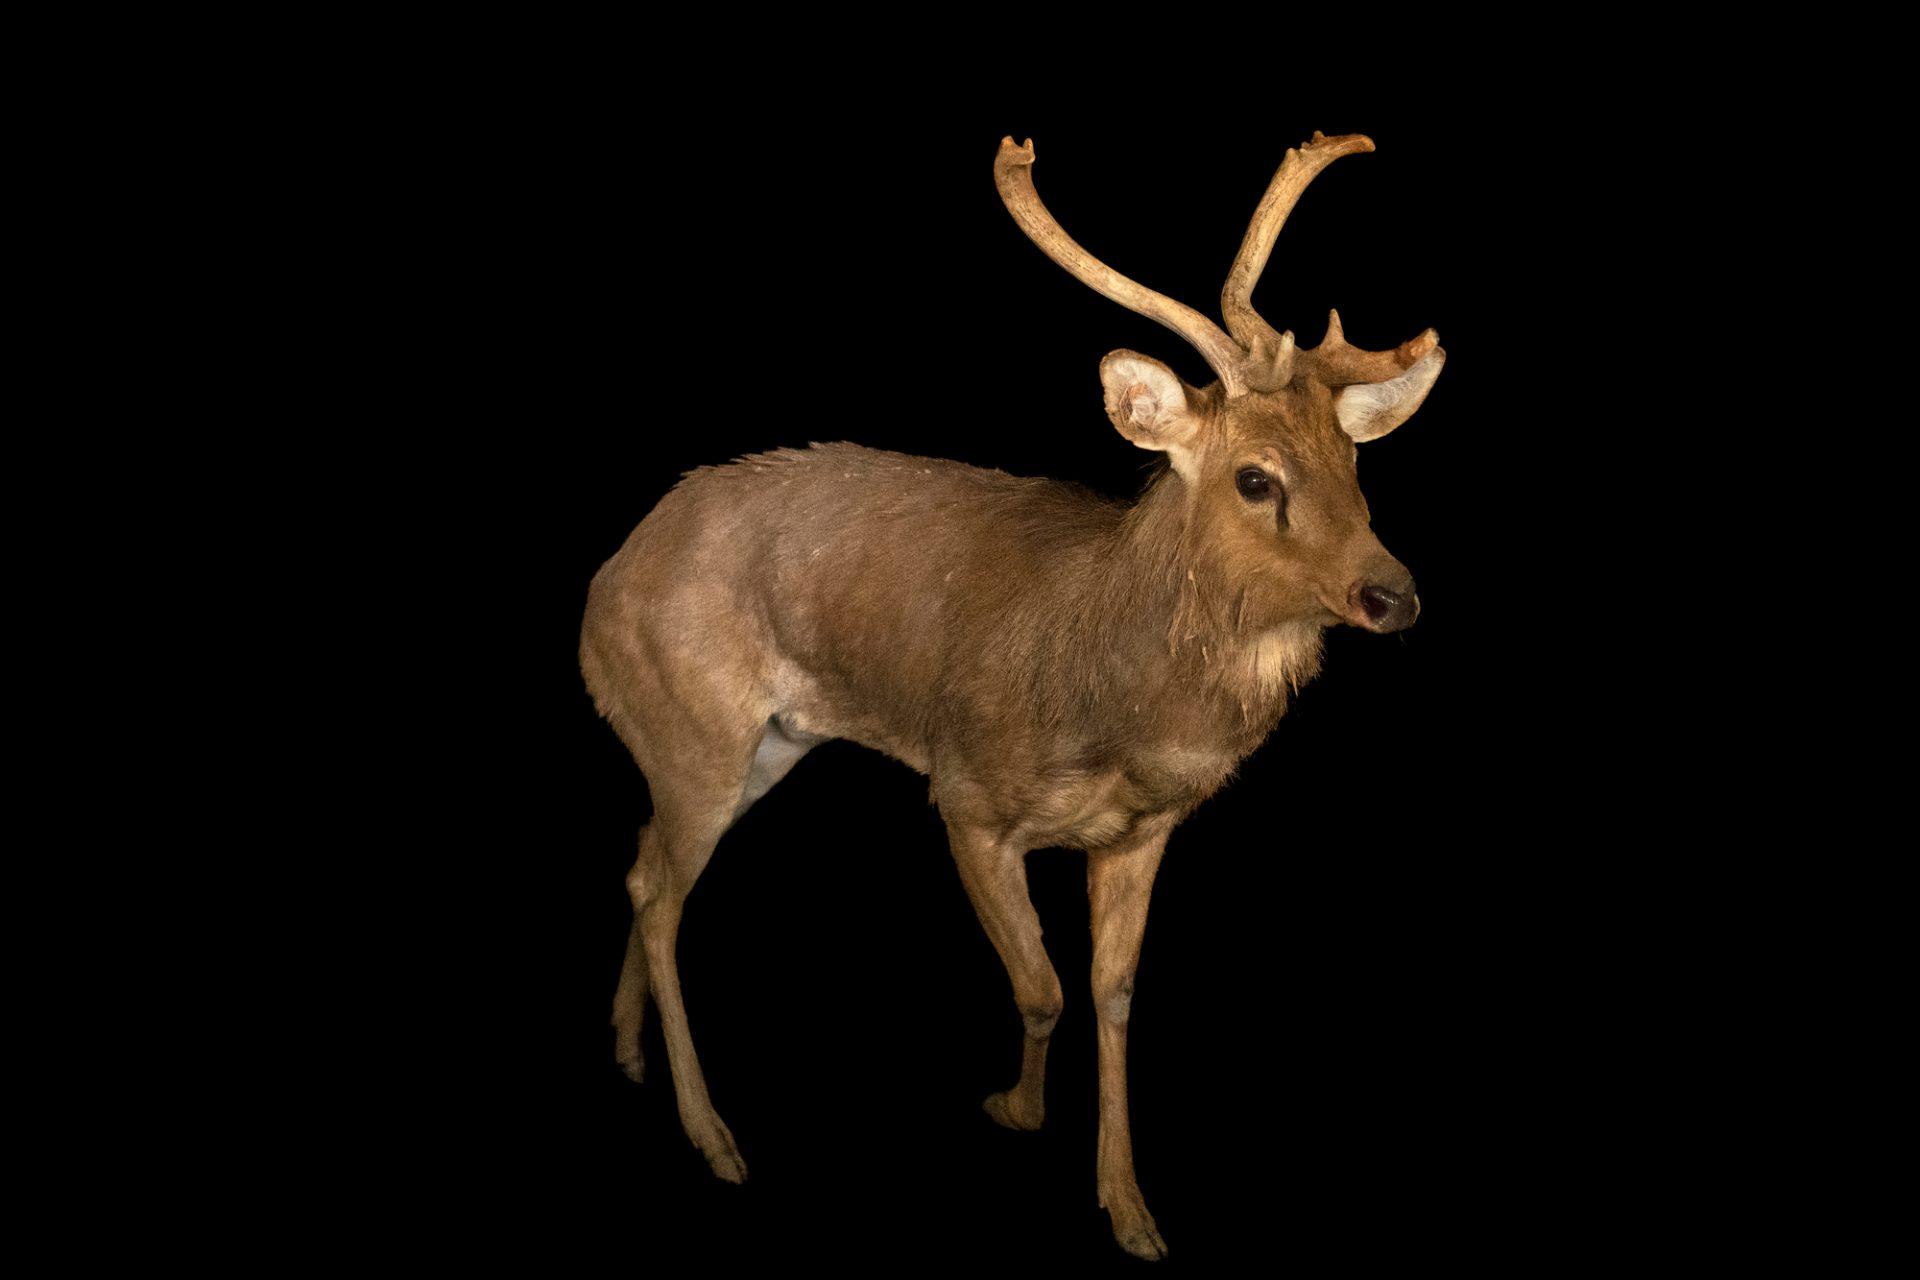 Photo: A male endangered Burmese brow-antlered deer (Rucervus eldii thamin) at the Lisbon Zoo.